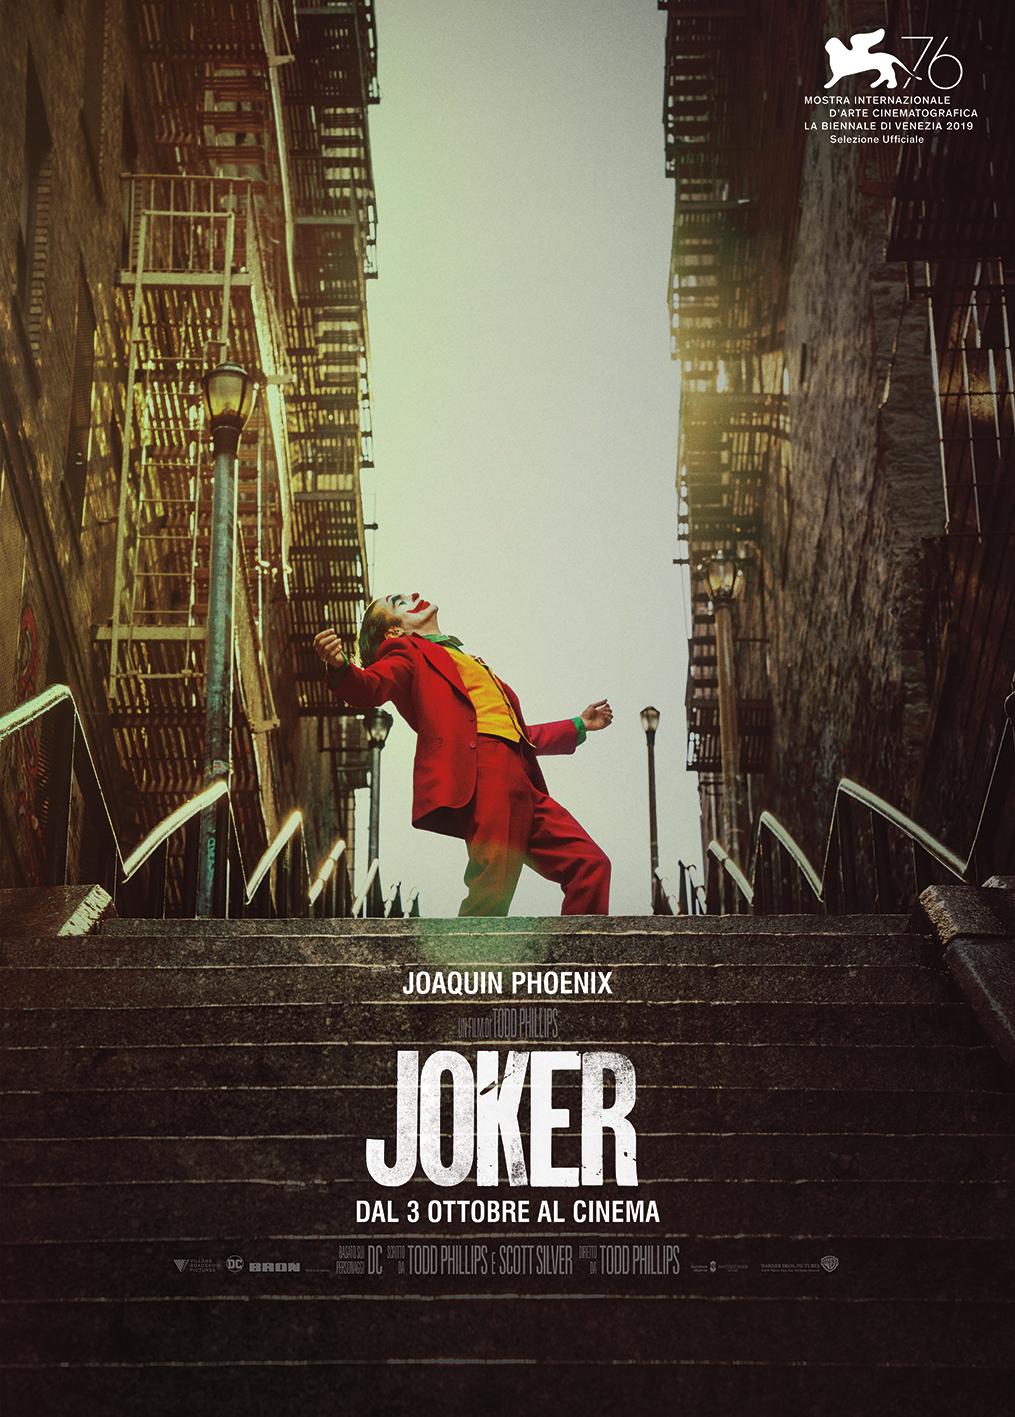 joker locandina poster italiano joaquin phoenix scale